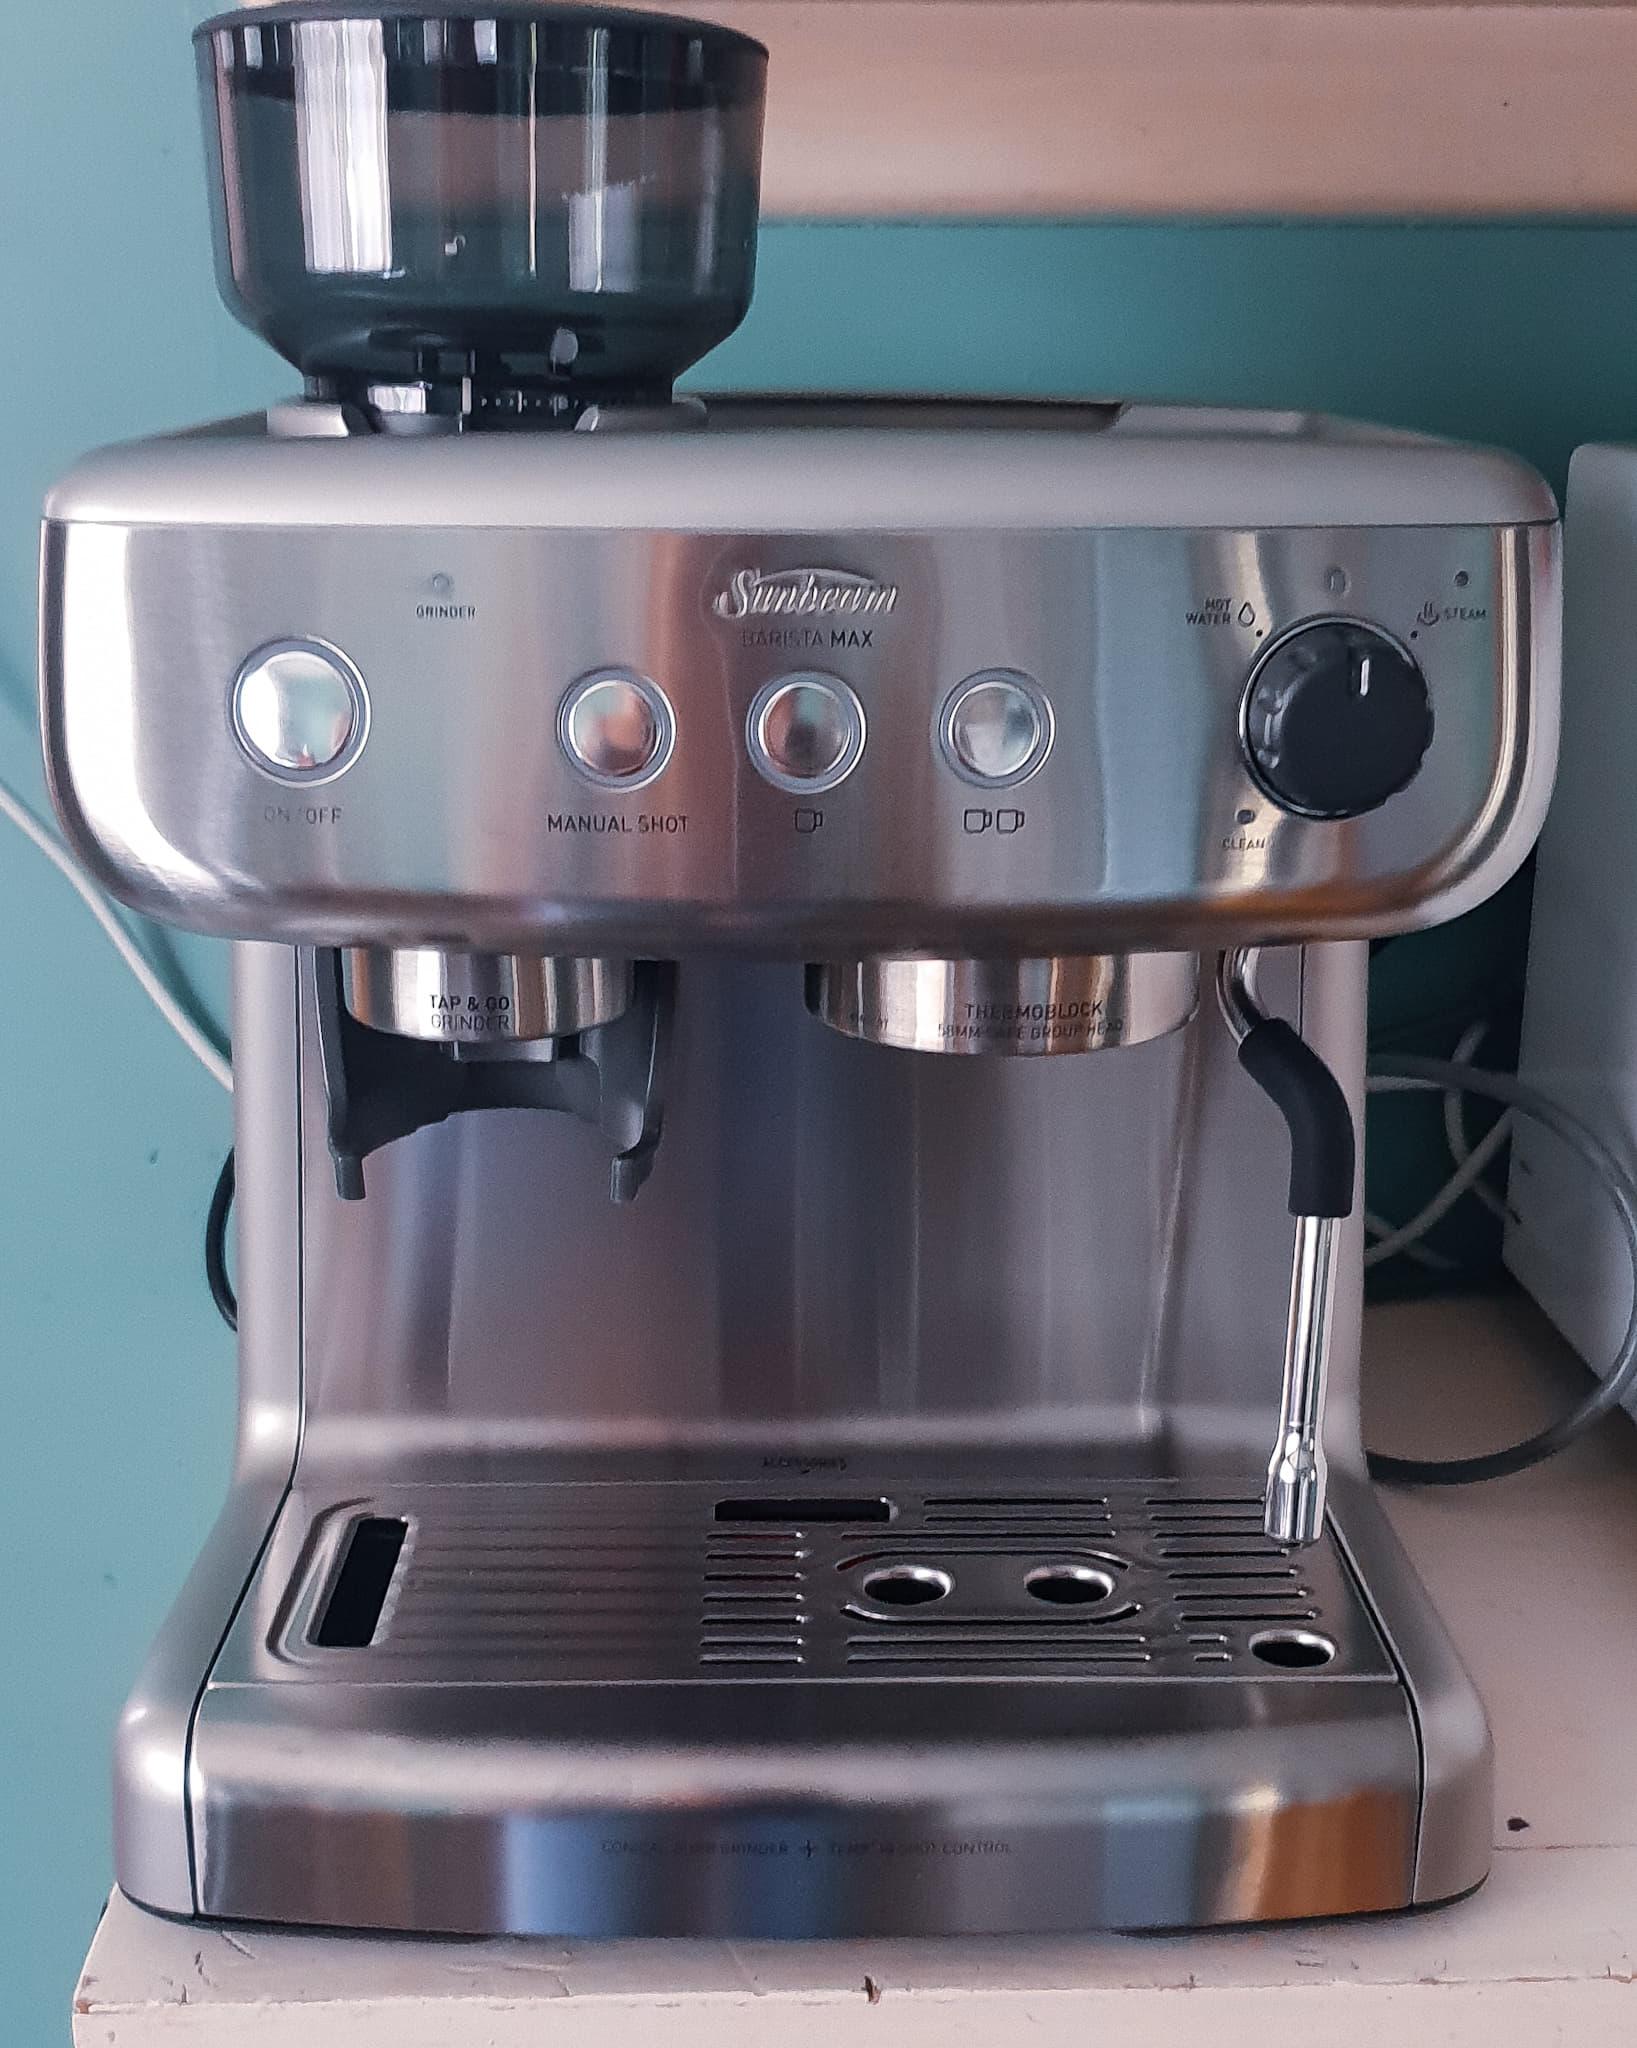 Sunbeam Barista Max Espresso